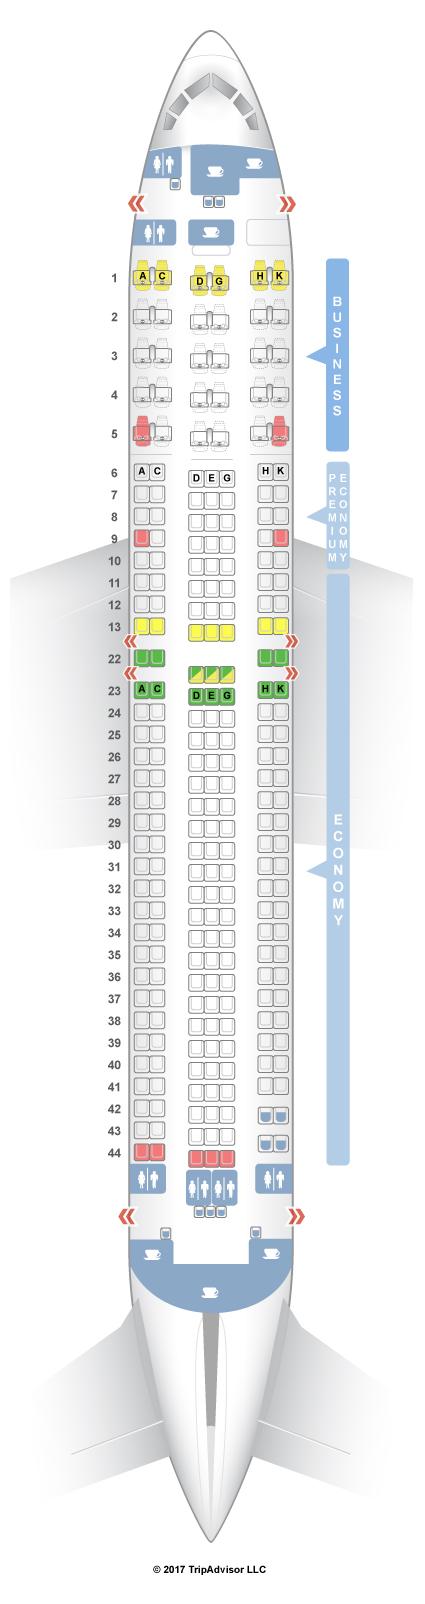 SeatGuru Seat Map Condor